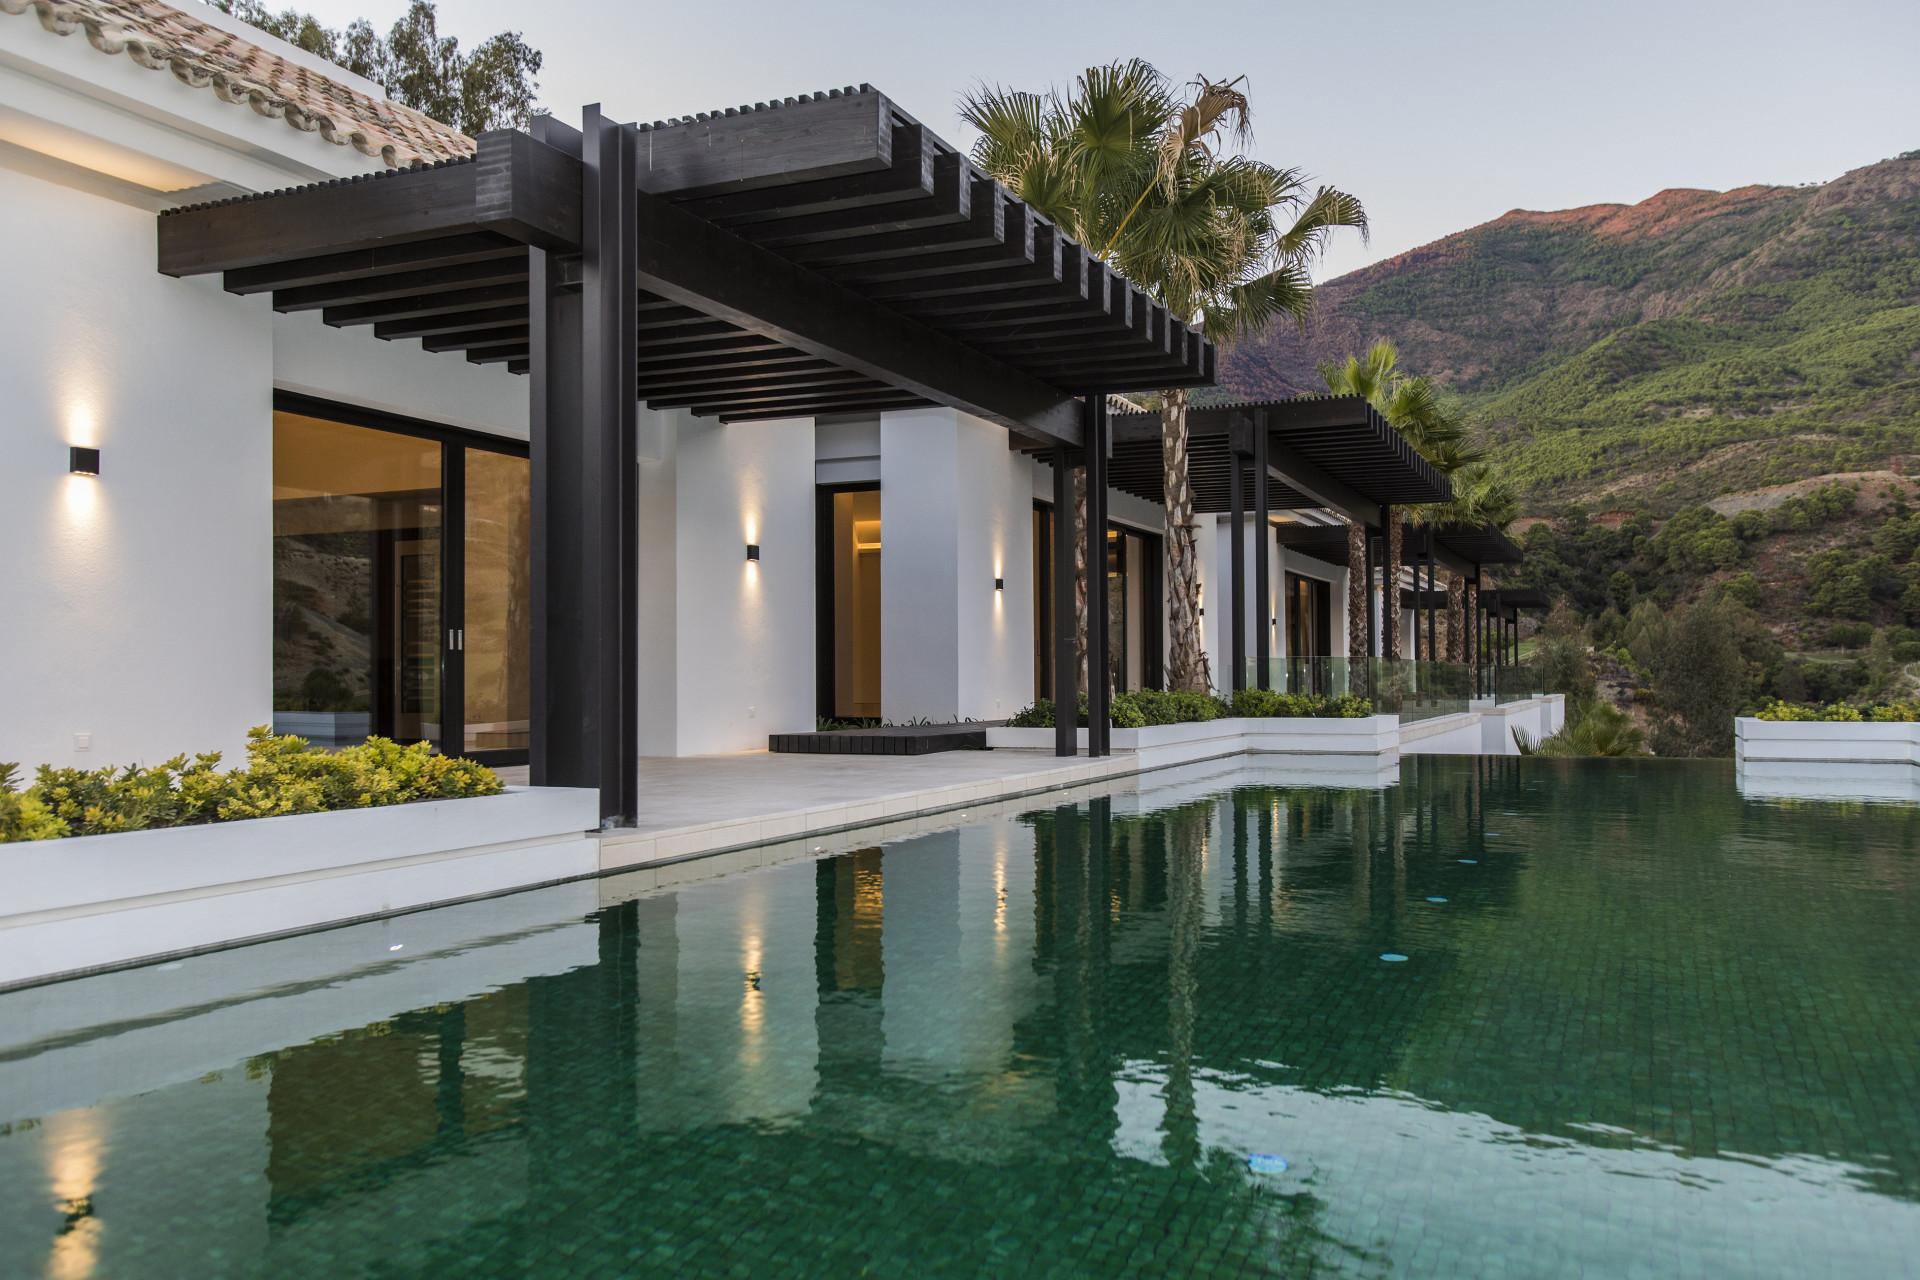 Exclusive luxurious mansion for sale in La Zagaleta - Benahavis